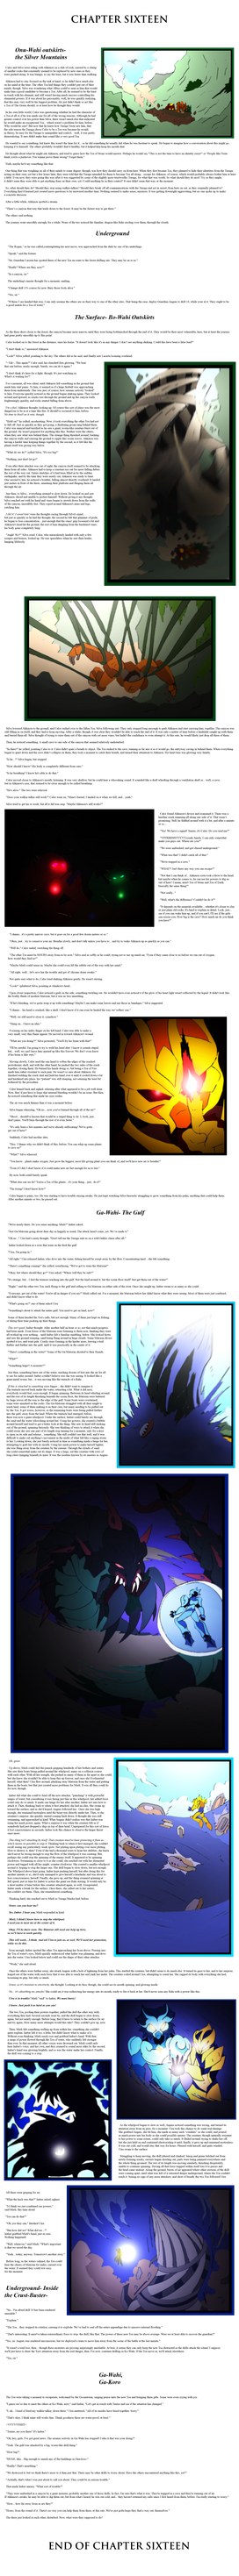 Bionicle- Nova Orbis- Mystery- Chapter 16